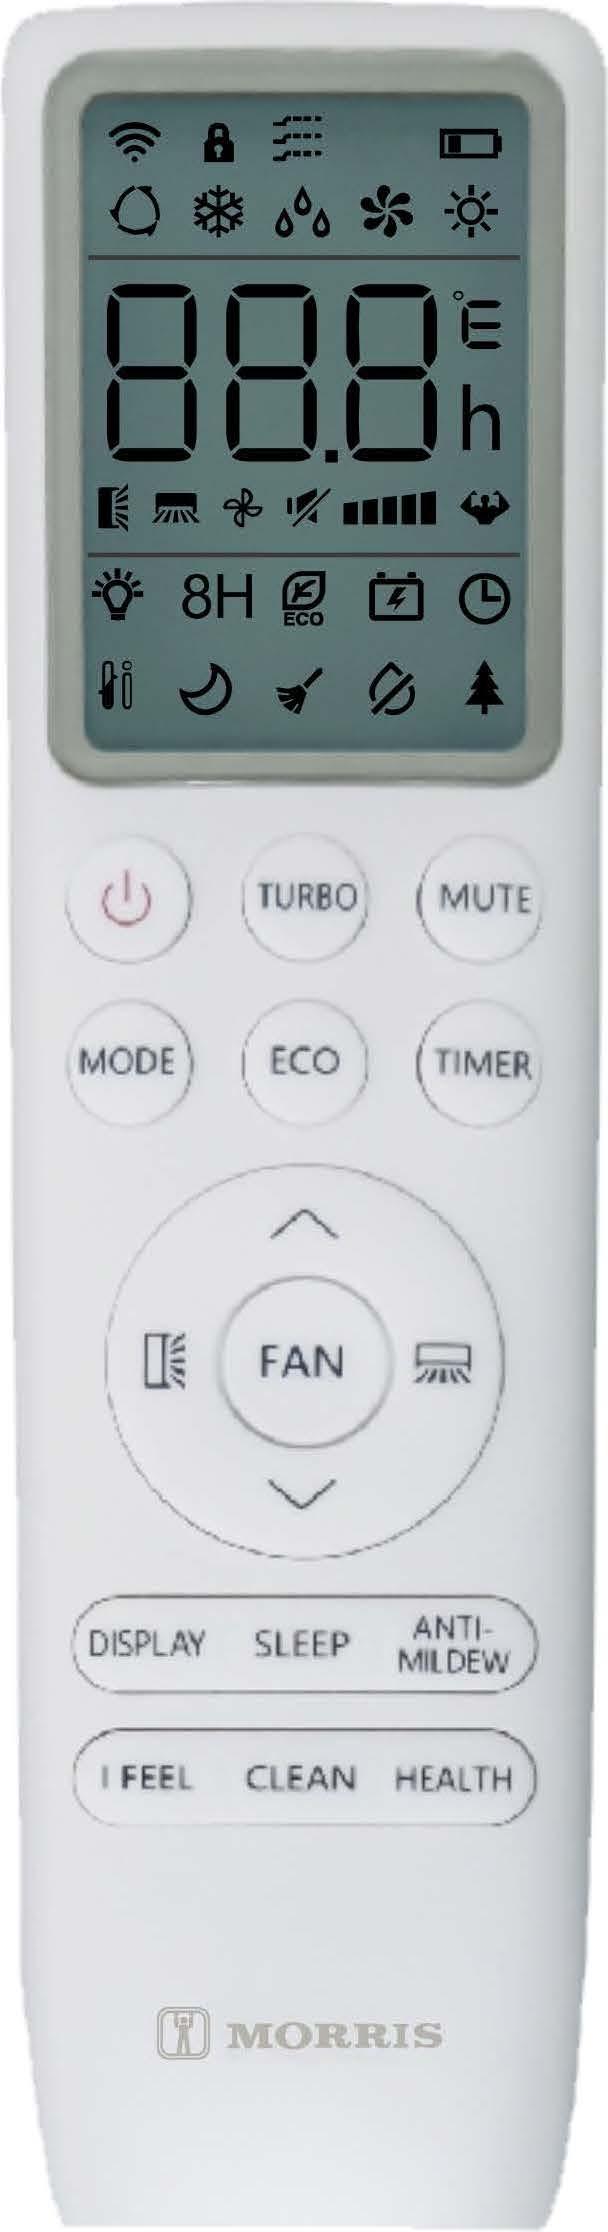 MORRIS WFIN-70160 ΚΛΙΜΑΤΙΣΤΙΚΟ Smart WiFi INVERTER  24000BTU